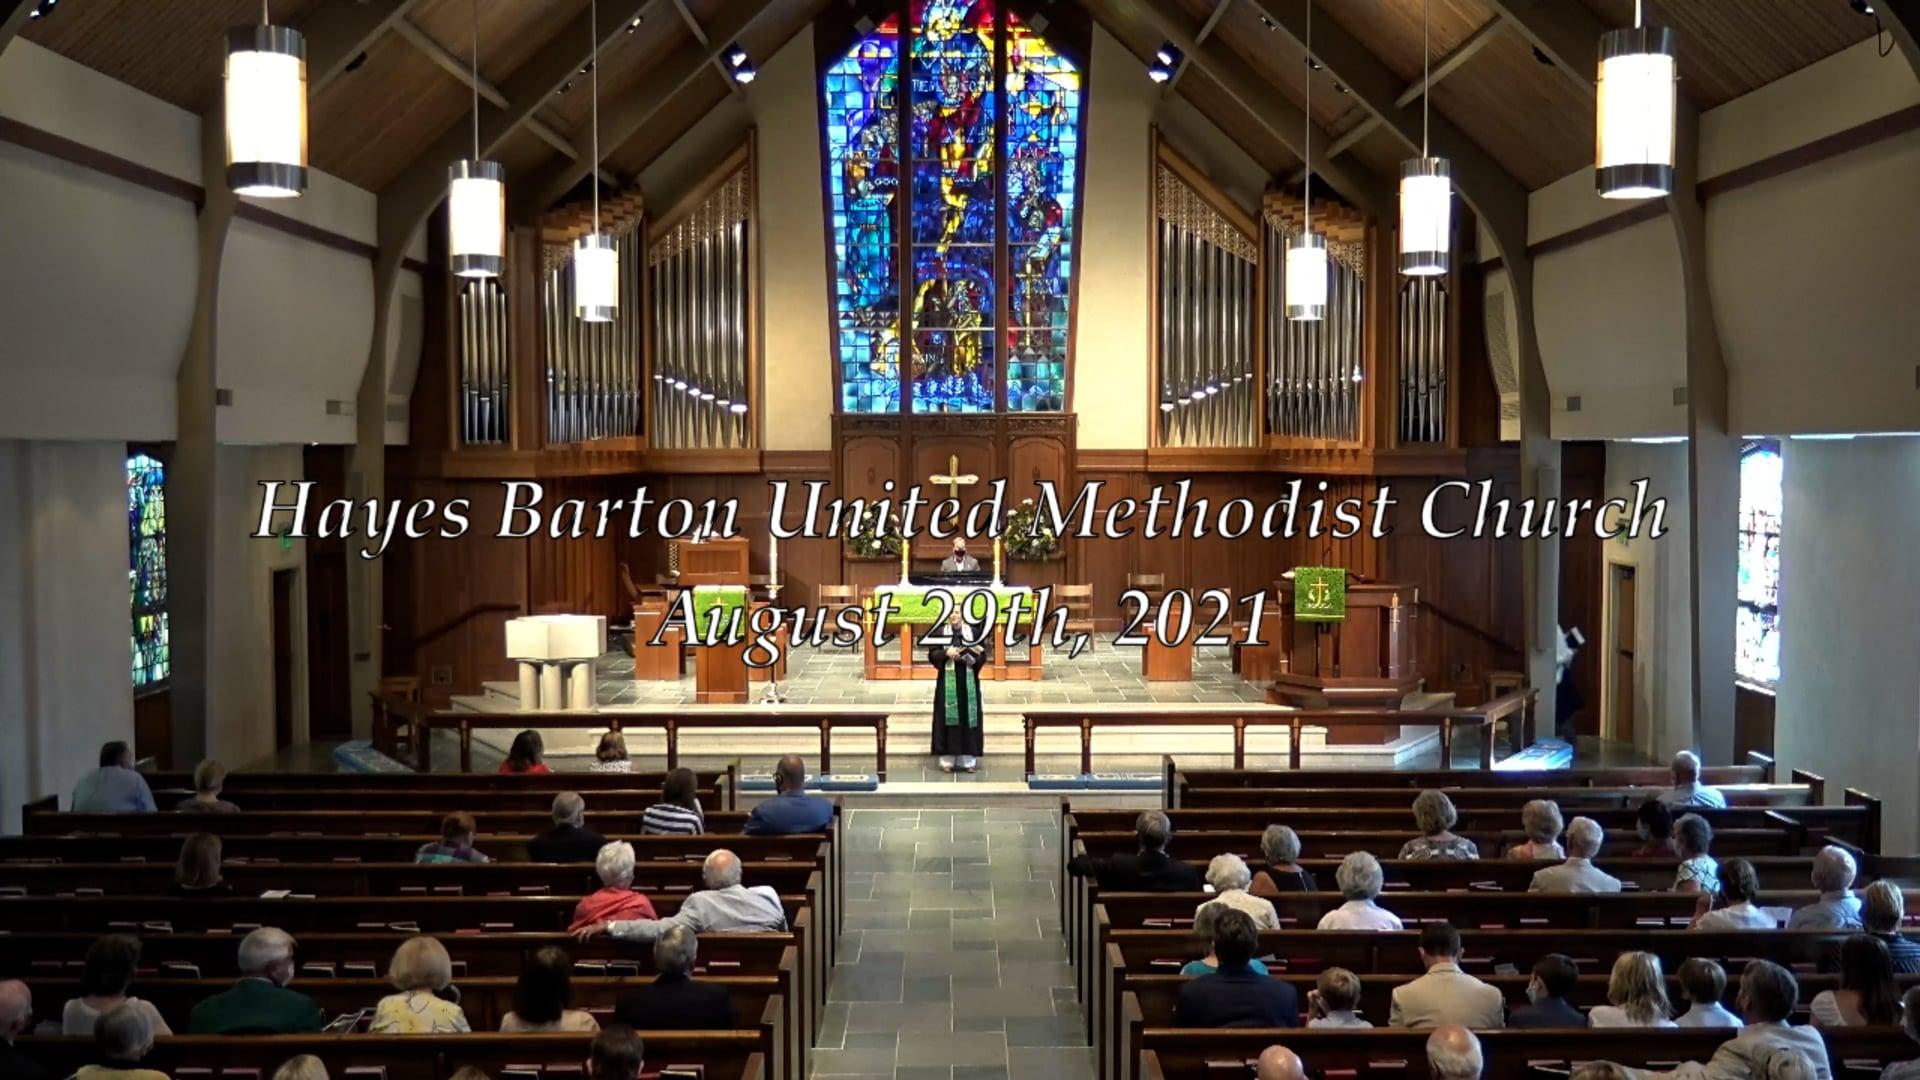 Sanctuary Worship - August 29, 2021